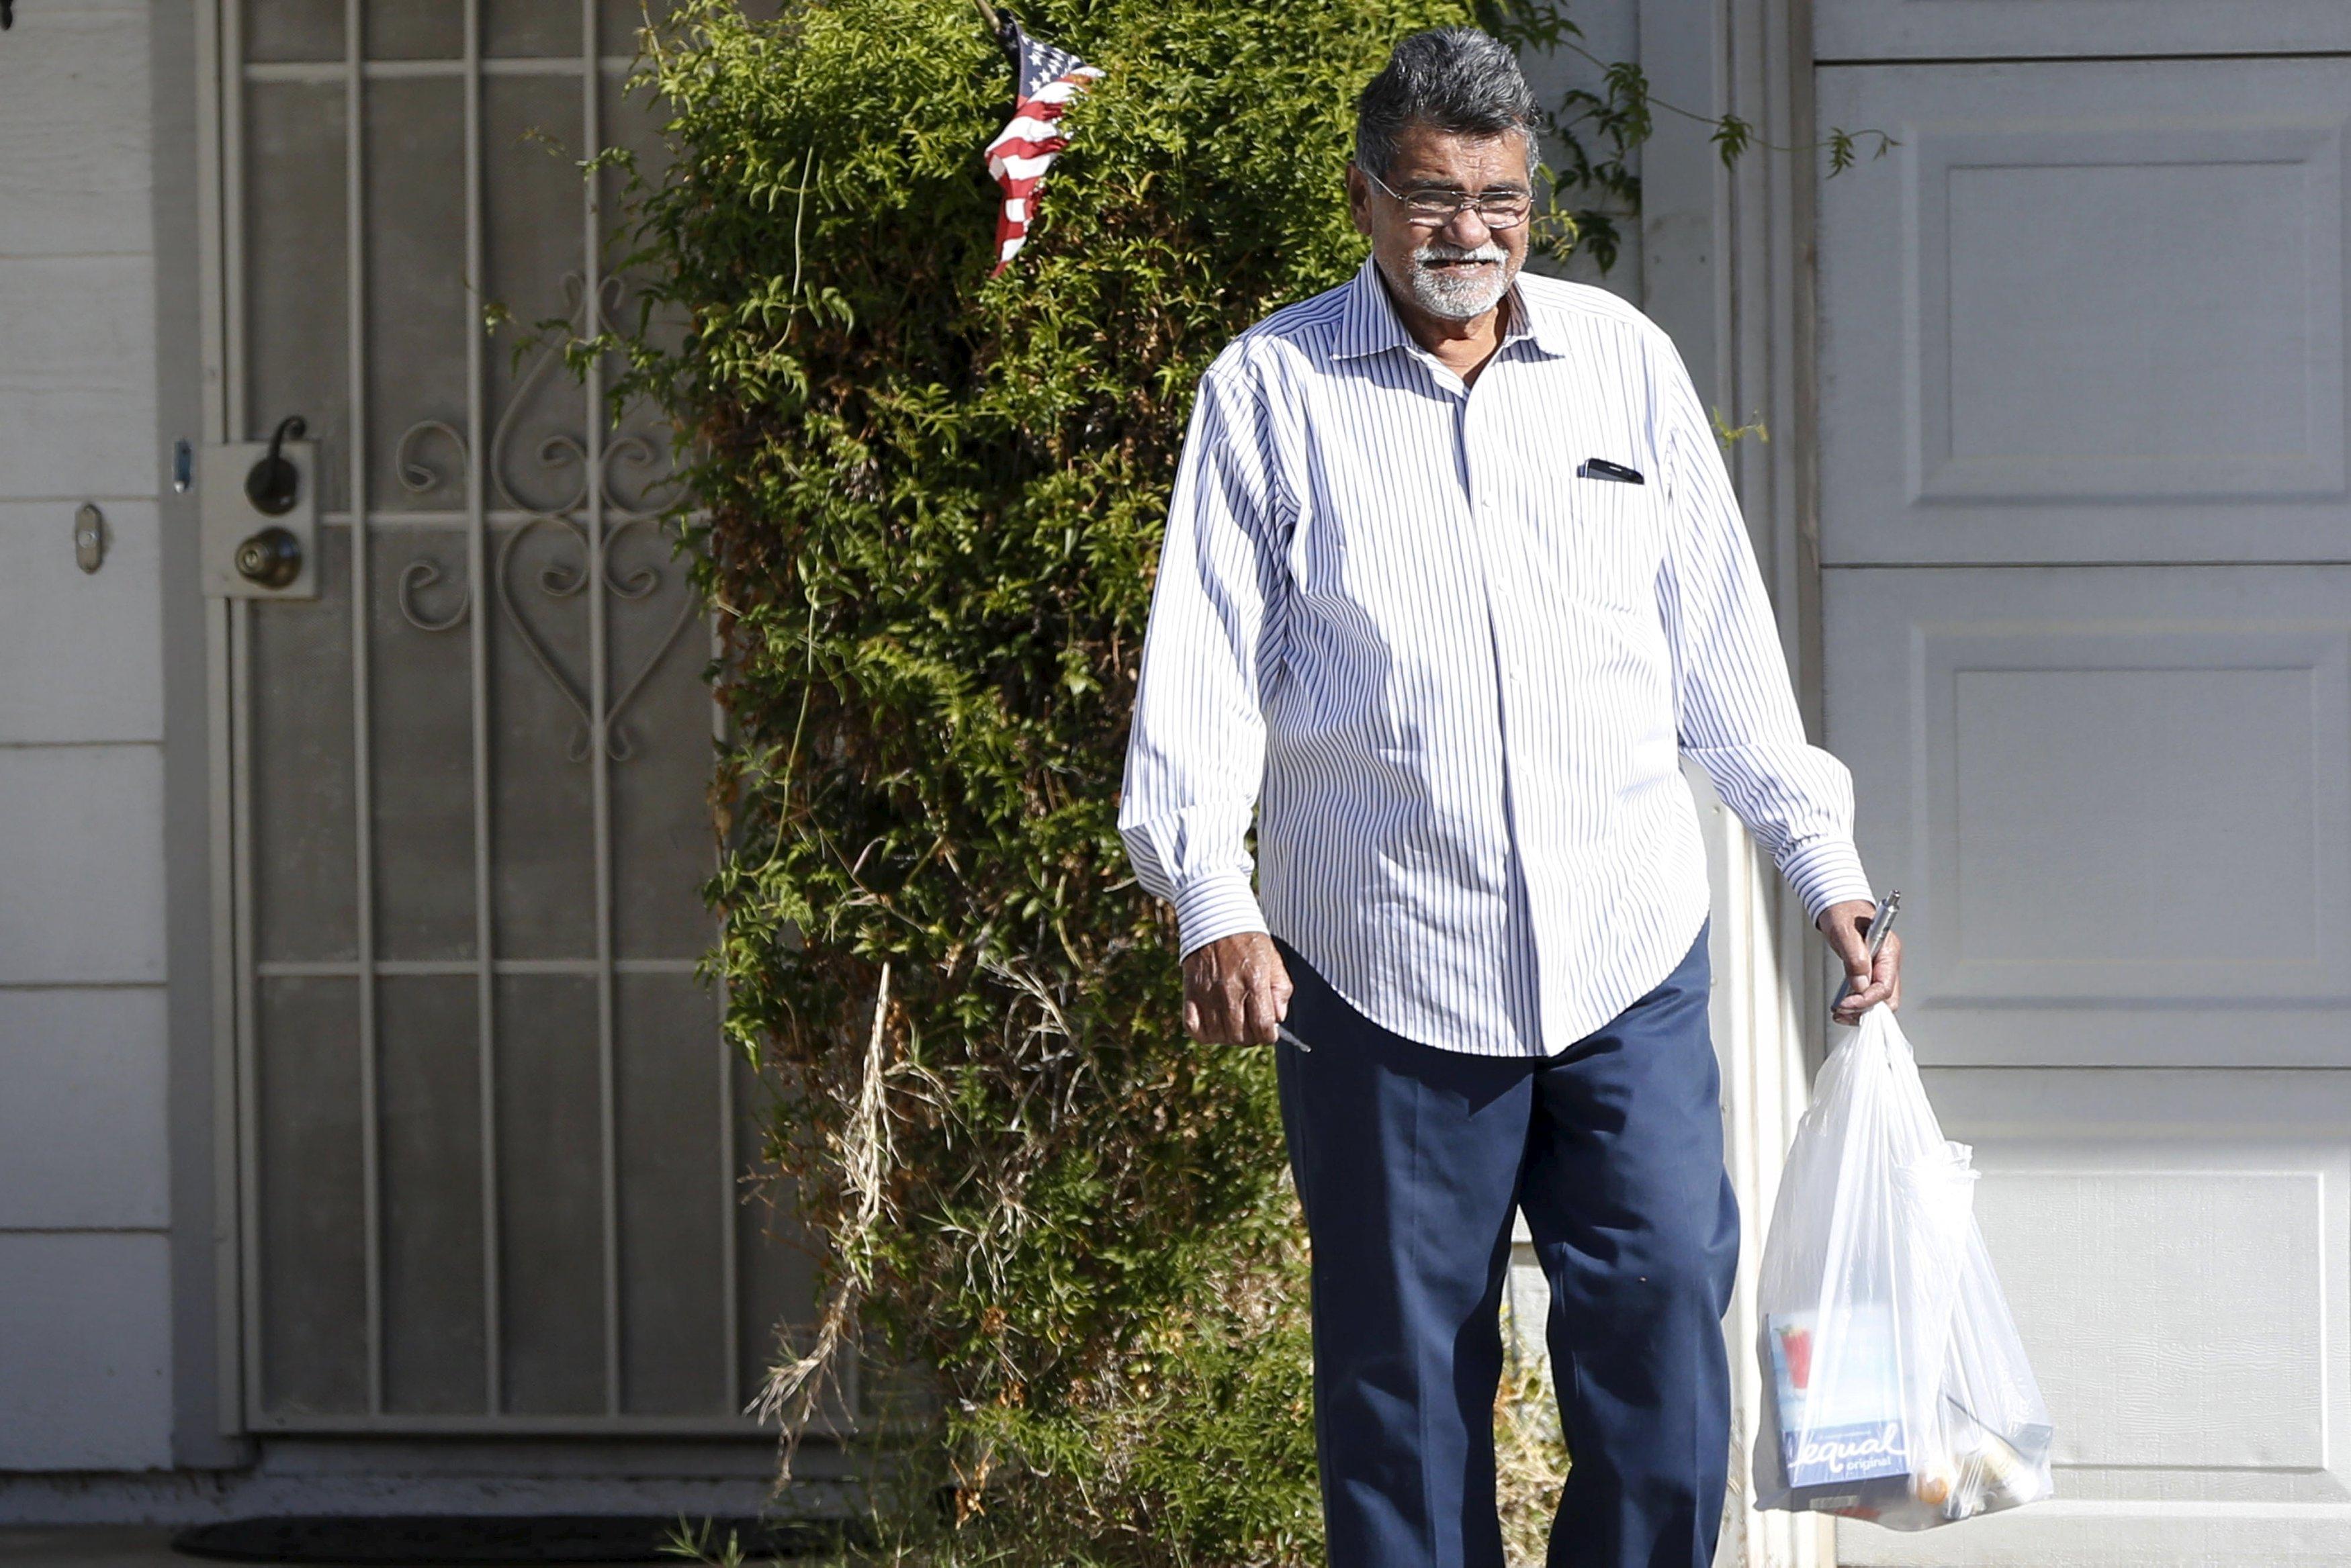 Syed Farook, father of San Bernardino shooting suspect Syed Rizwan Farook, leaves a residence in Riverside